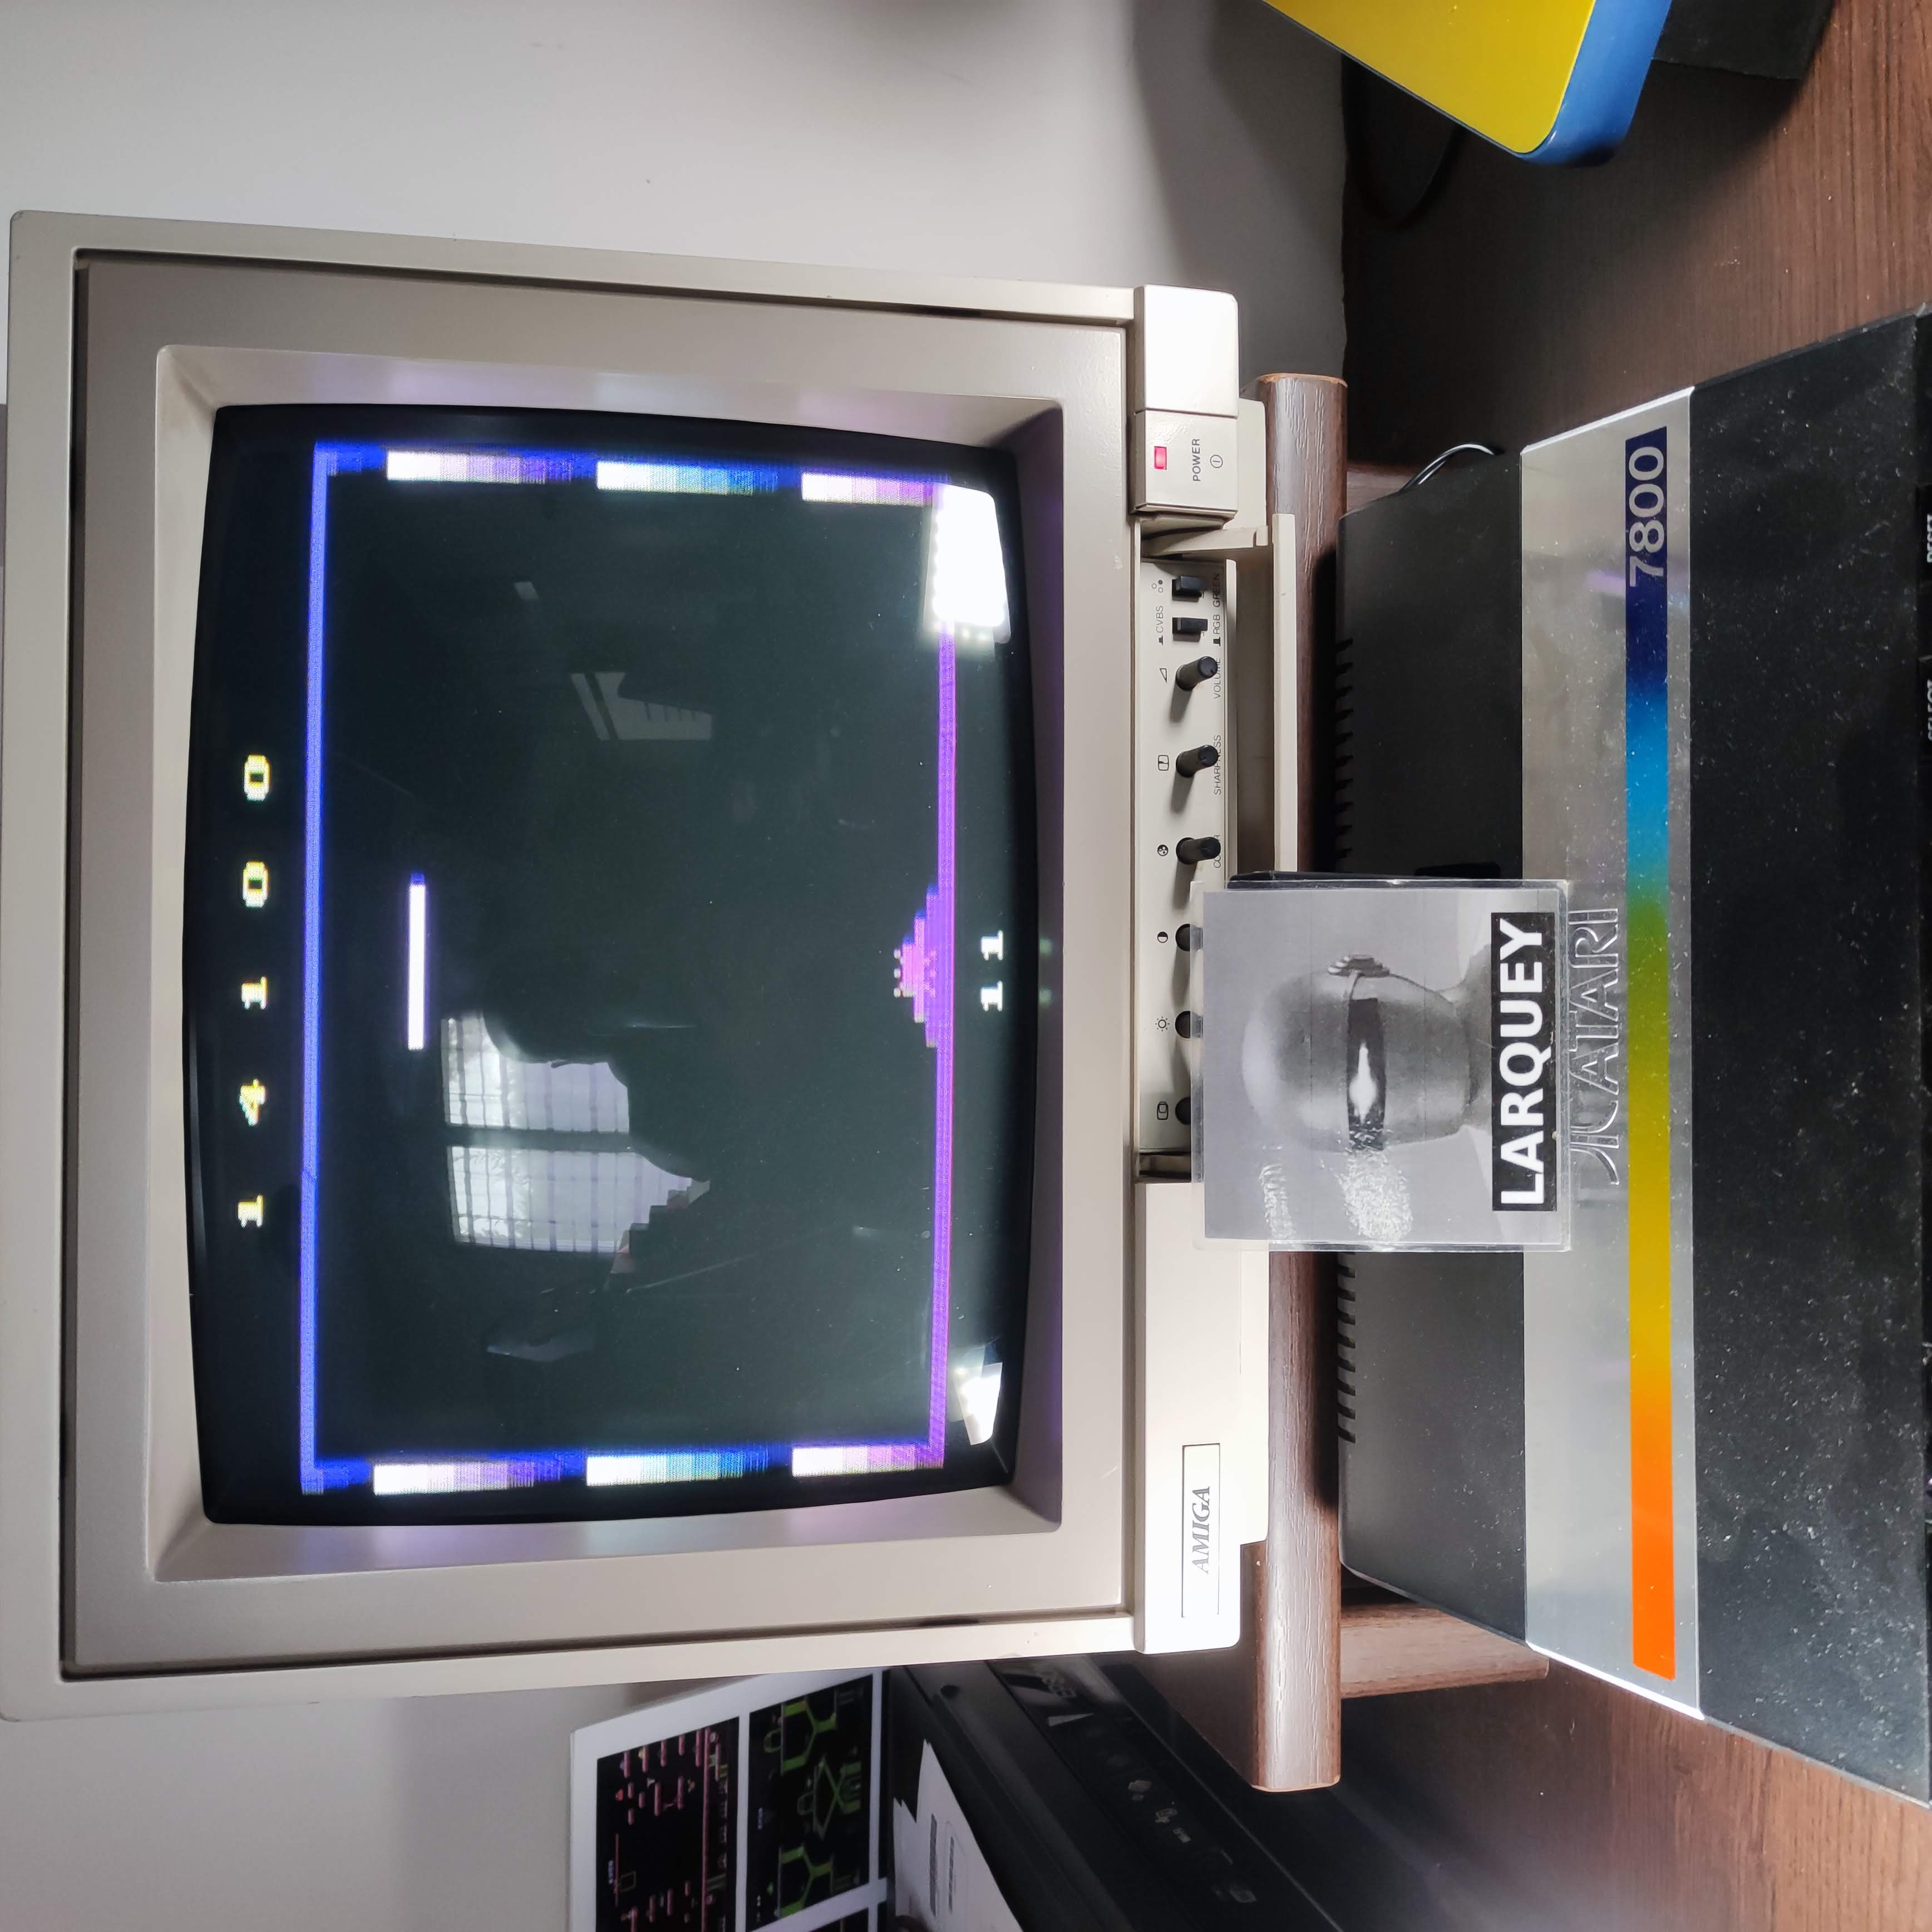 Larquey: Phantom Tank: Game 1 (Atari 2600) 14,100 points on 2020-10-12 12:18:48